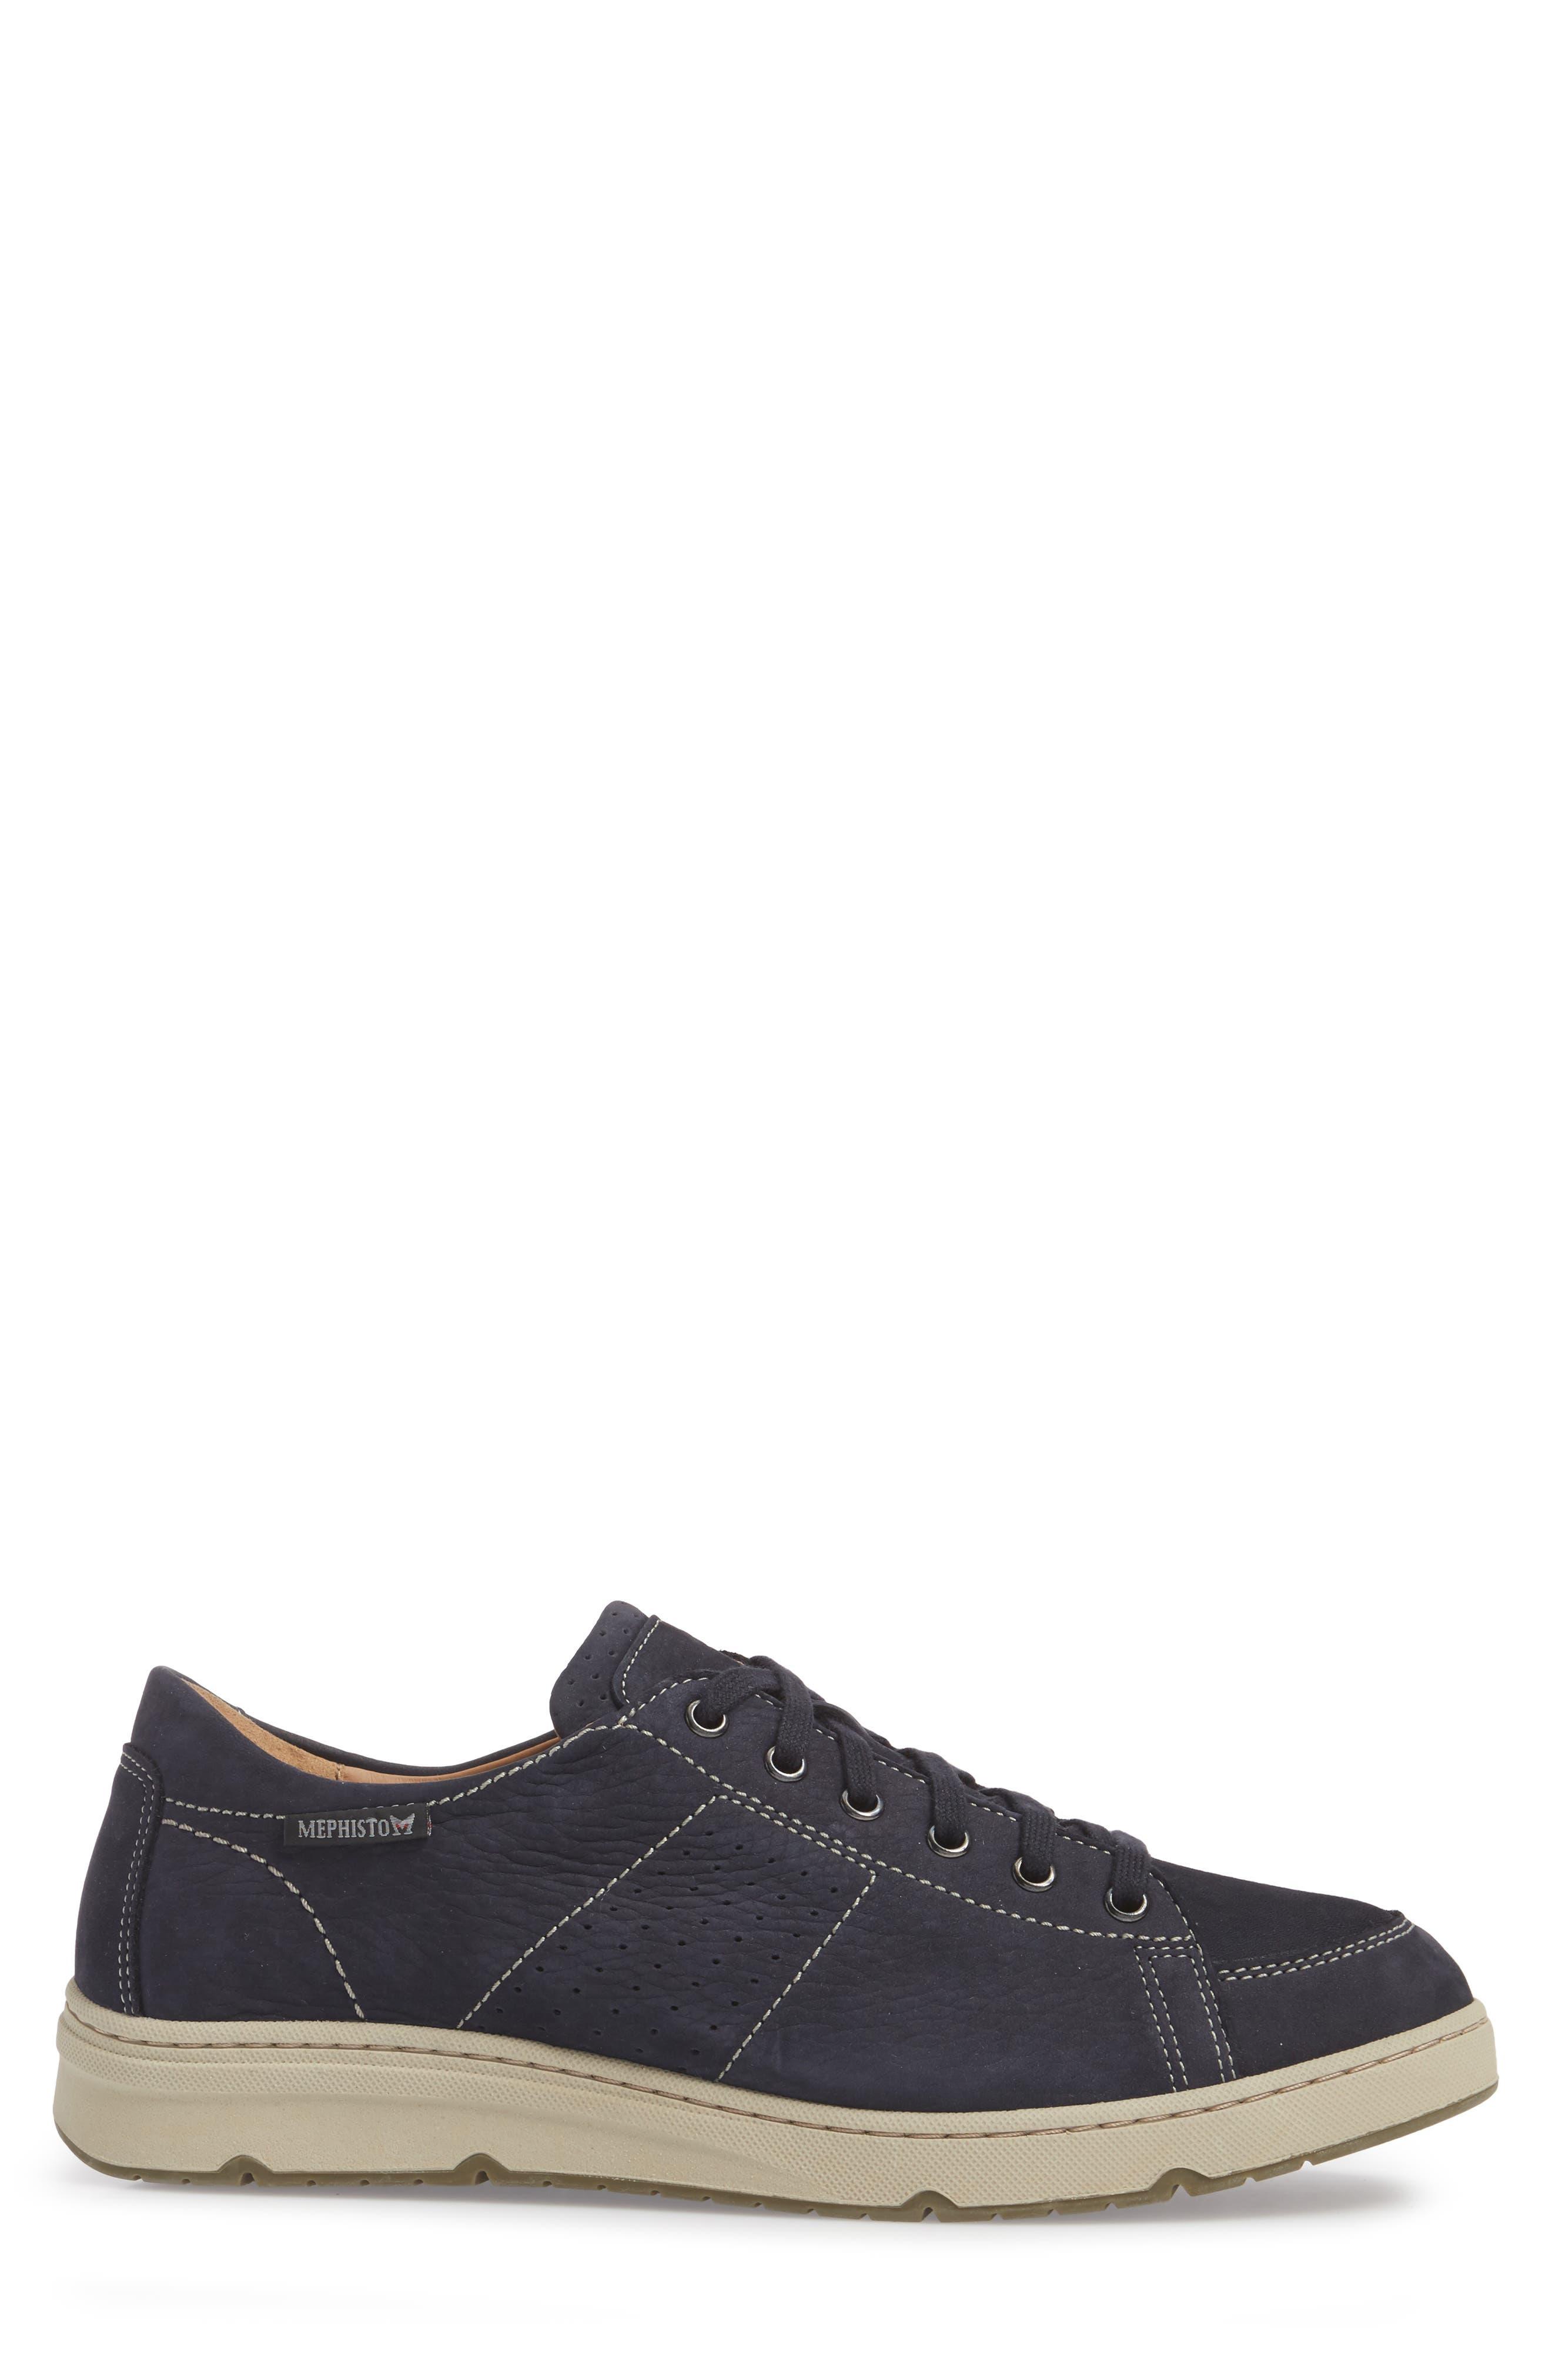 MEPHISTO, Jerome Sneaker, Alternate thumbnail 3, color, 411